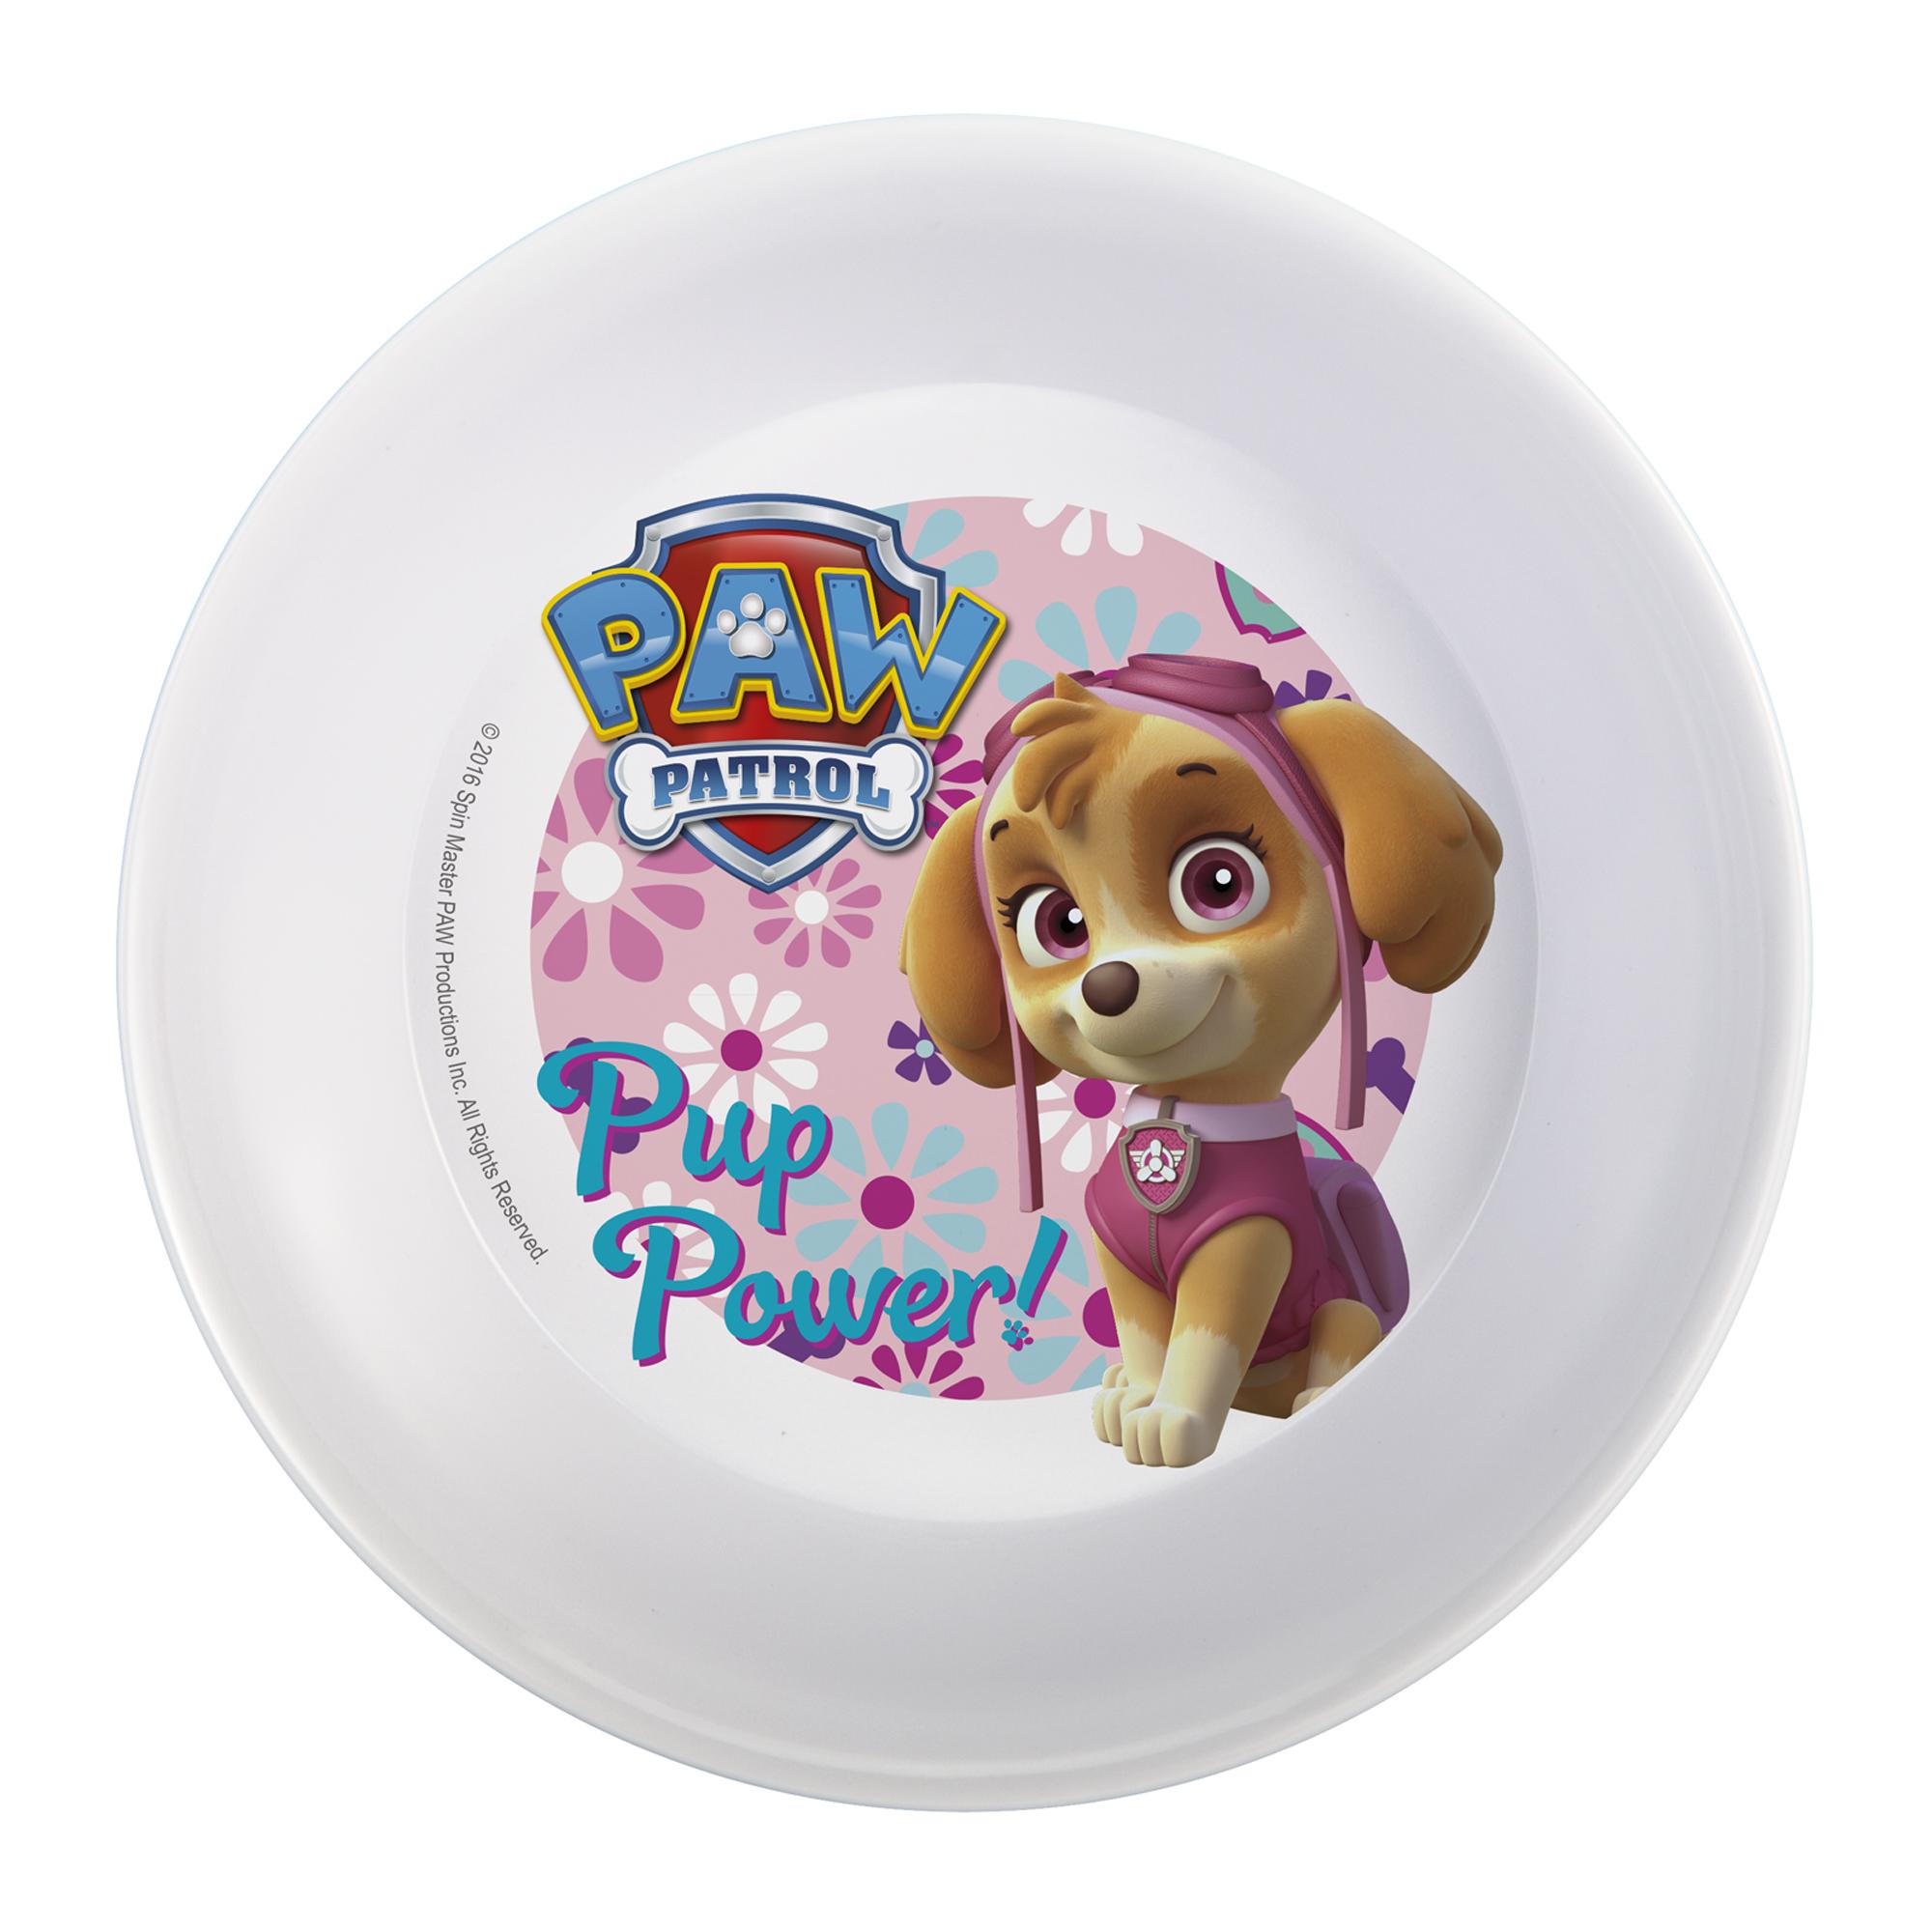 Paw Patrol Kids Dinnerware Set, Skye & Everest, 3-piece set slideshow image 5